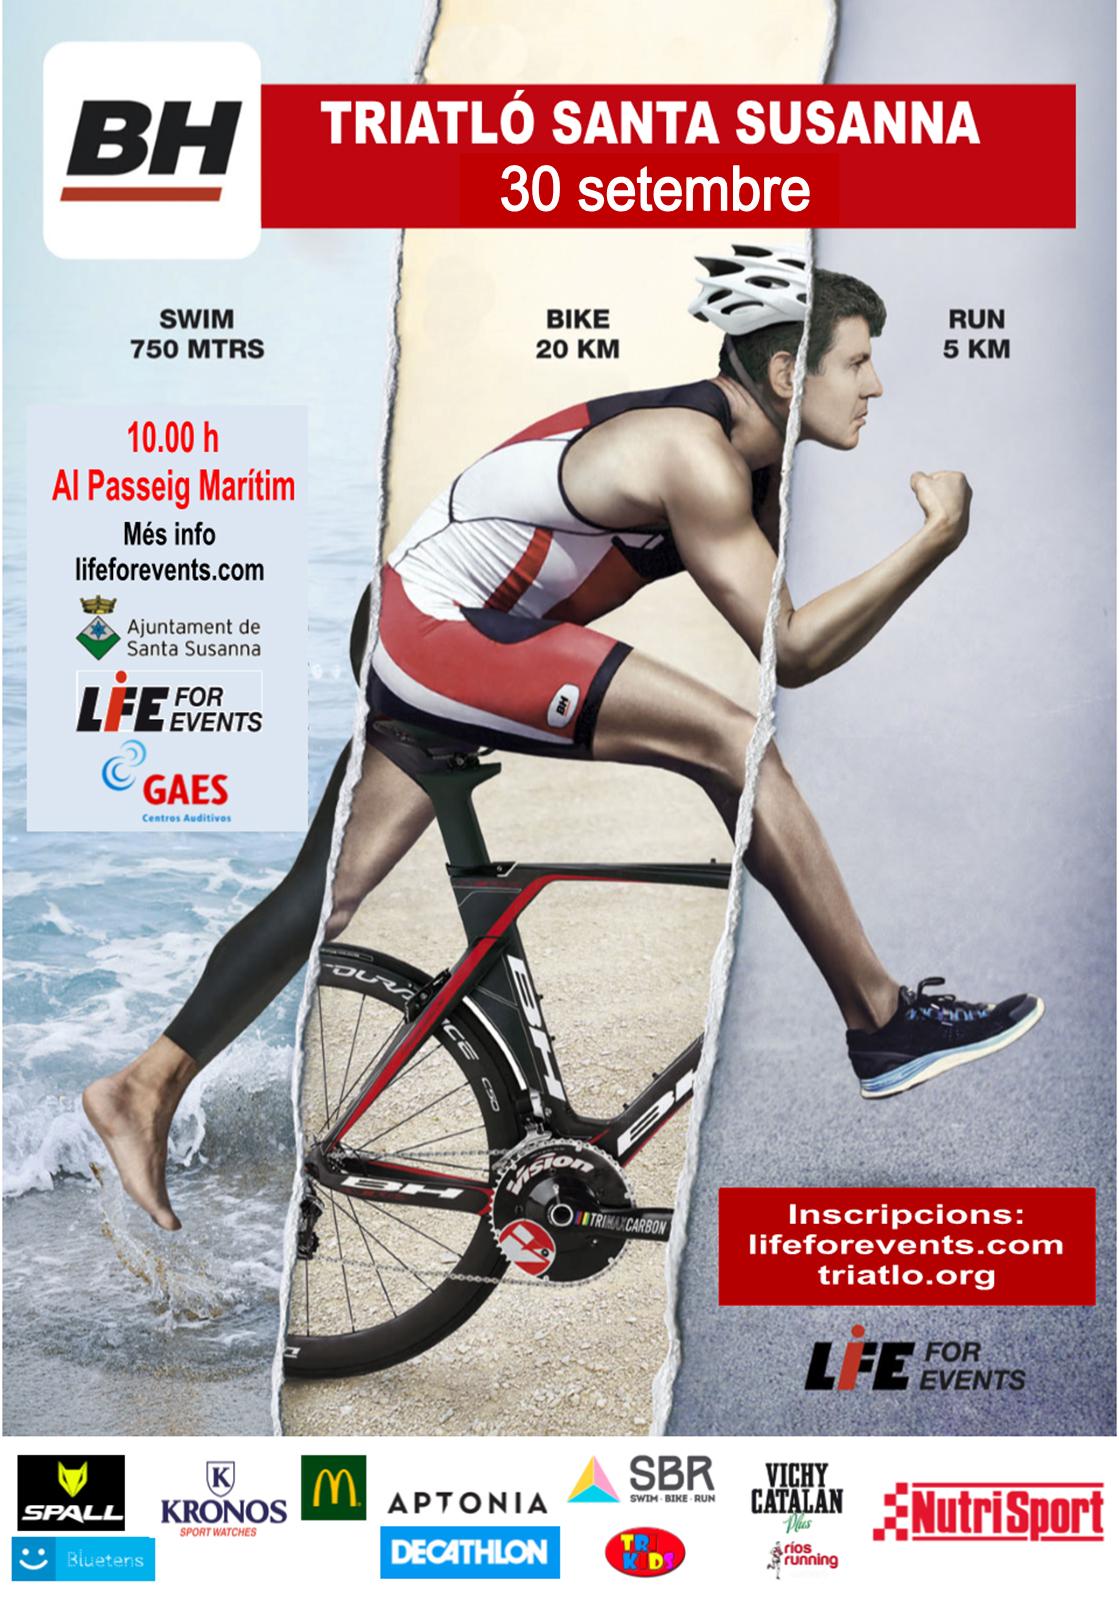 Santa Susanna's Triathlon